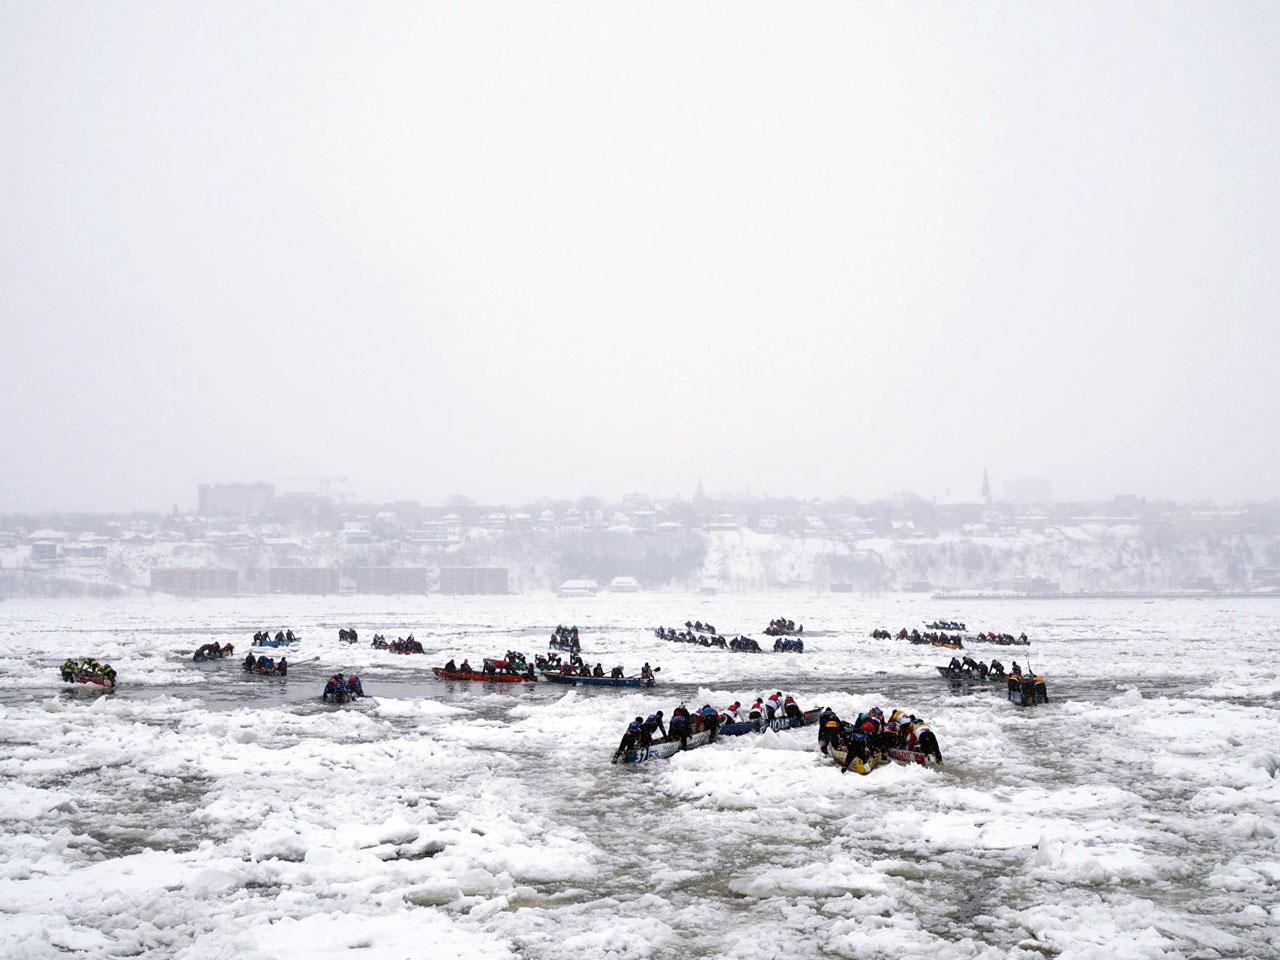 Quebec City in Winter